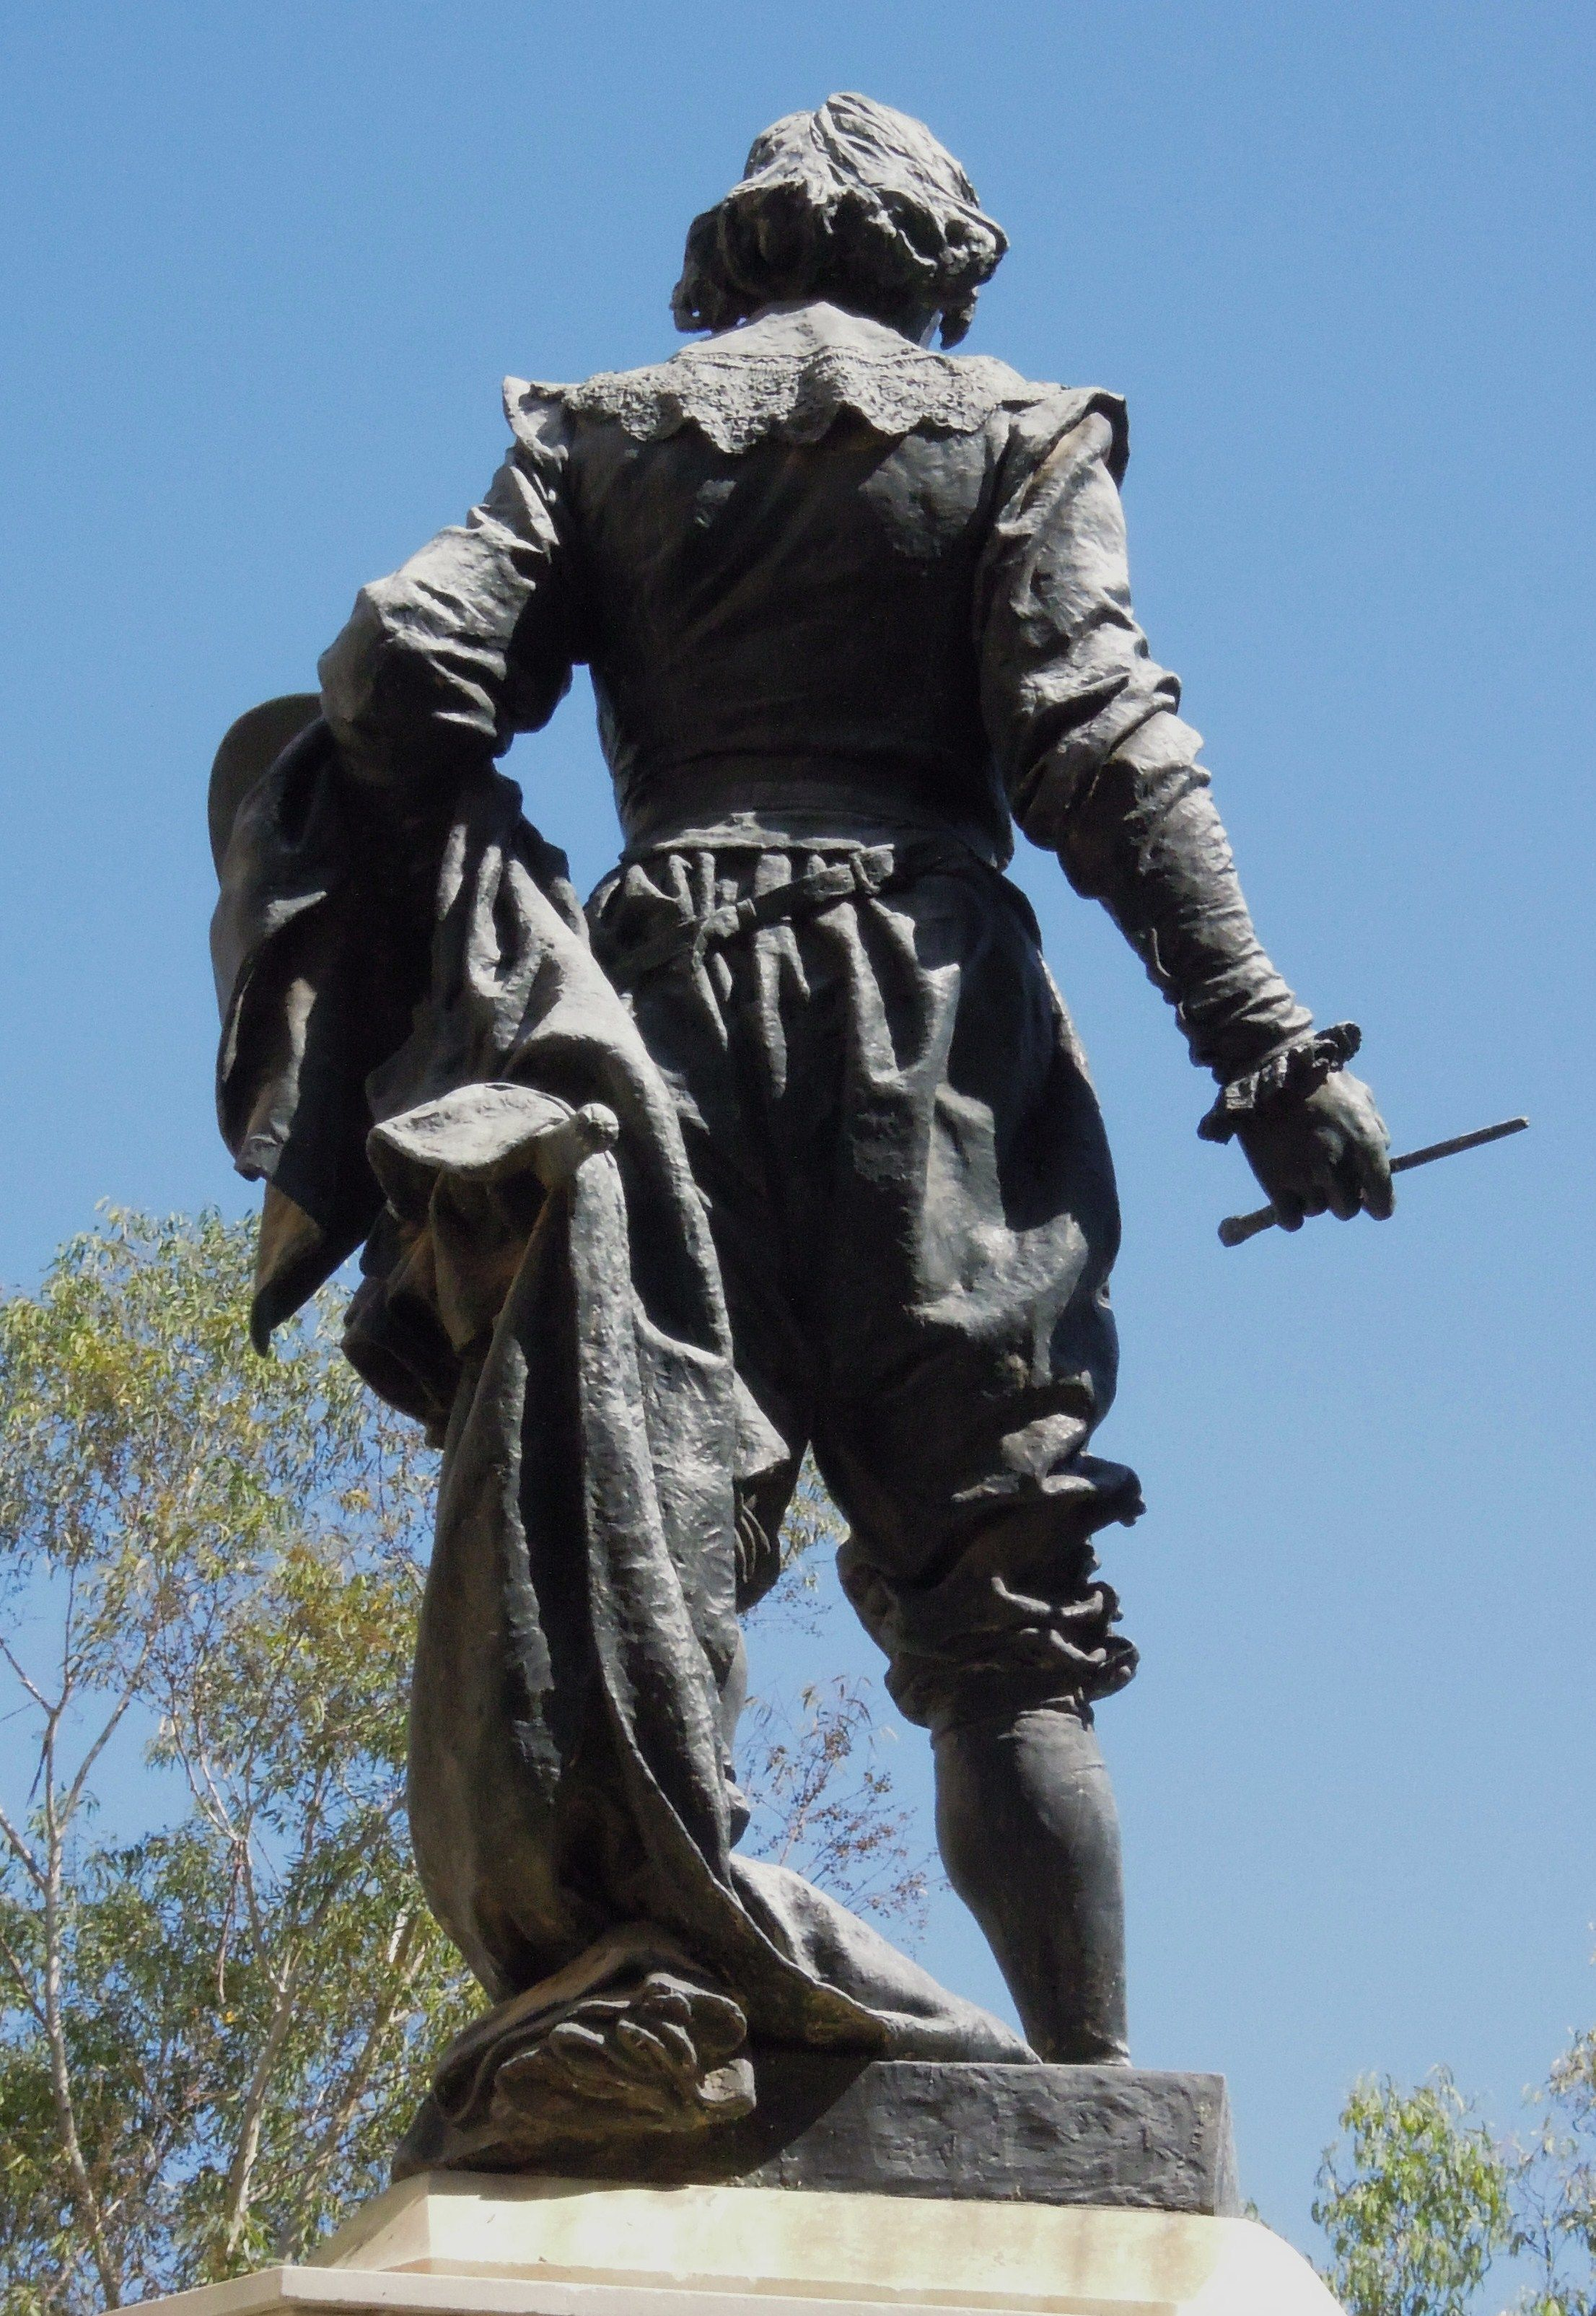 Monumento al pintor José de Ribera, Valencia | sculpture | Pinterest ...